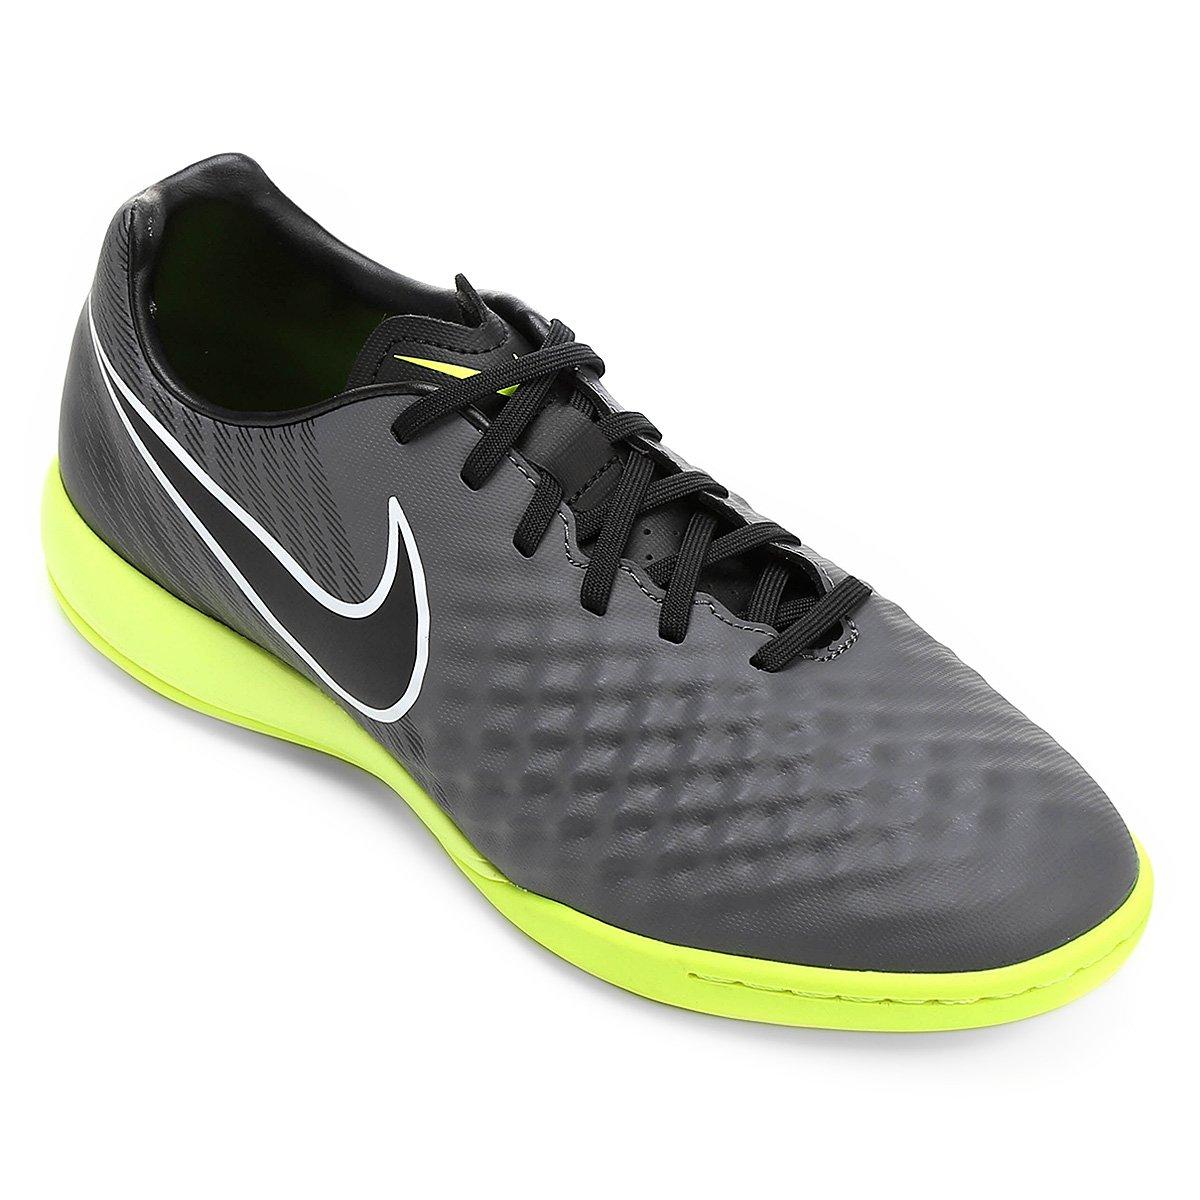 fcfa7b53d1 Chuteira Futsal Nike Magista Onda II IC Masculina - Compre Agora ...